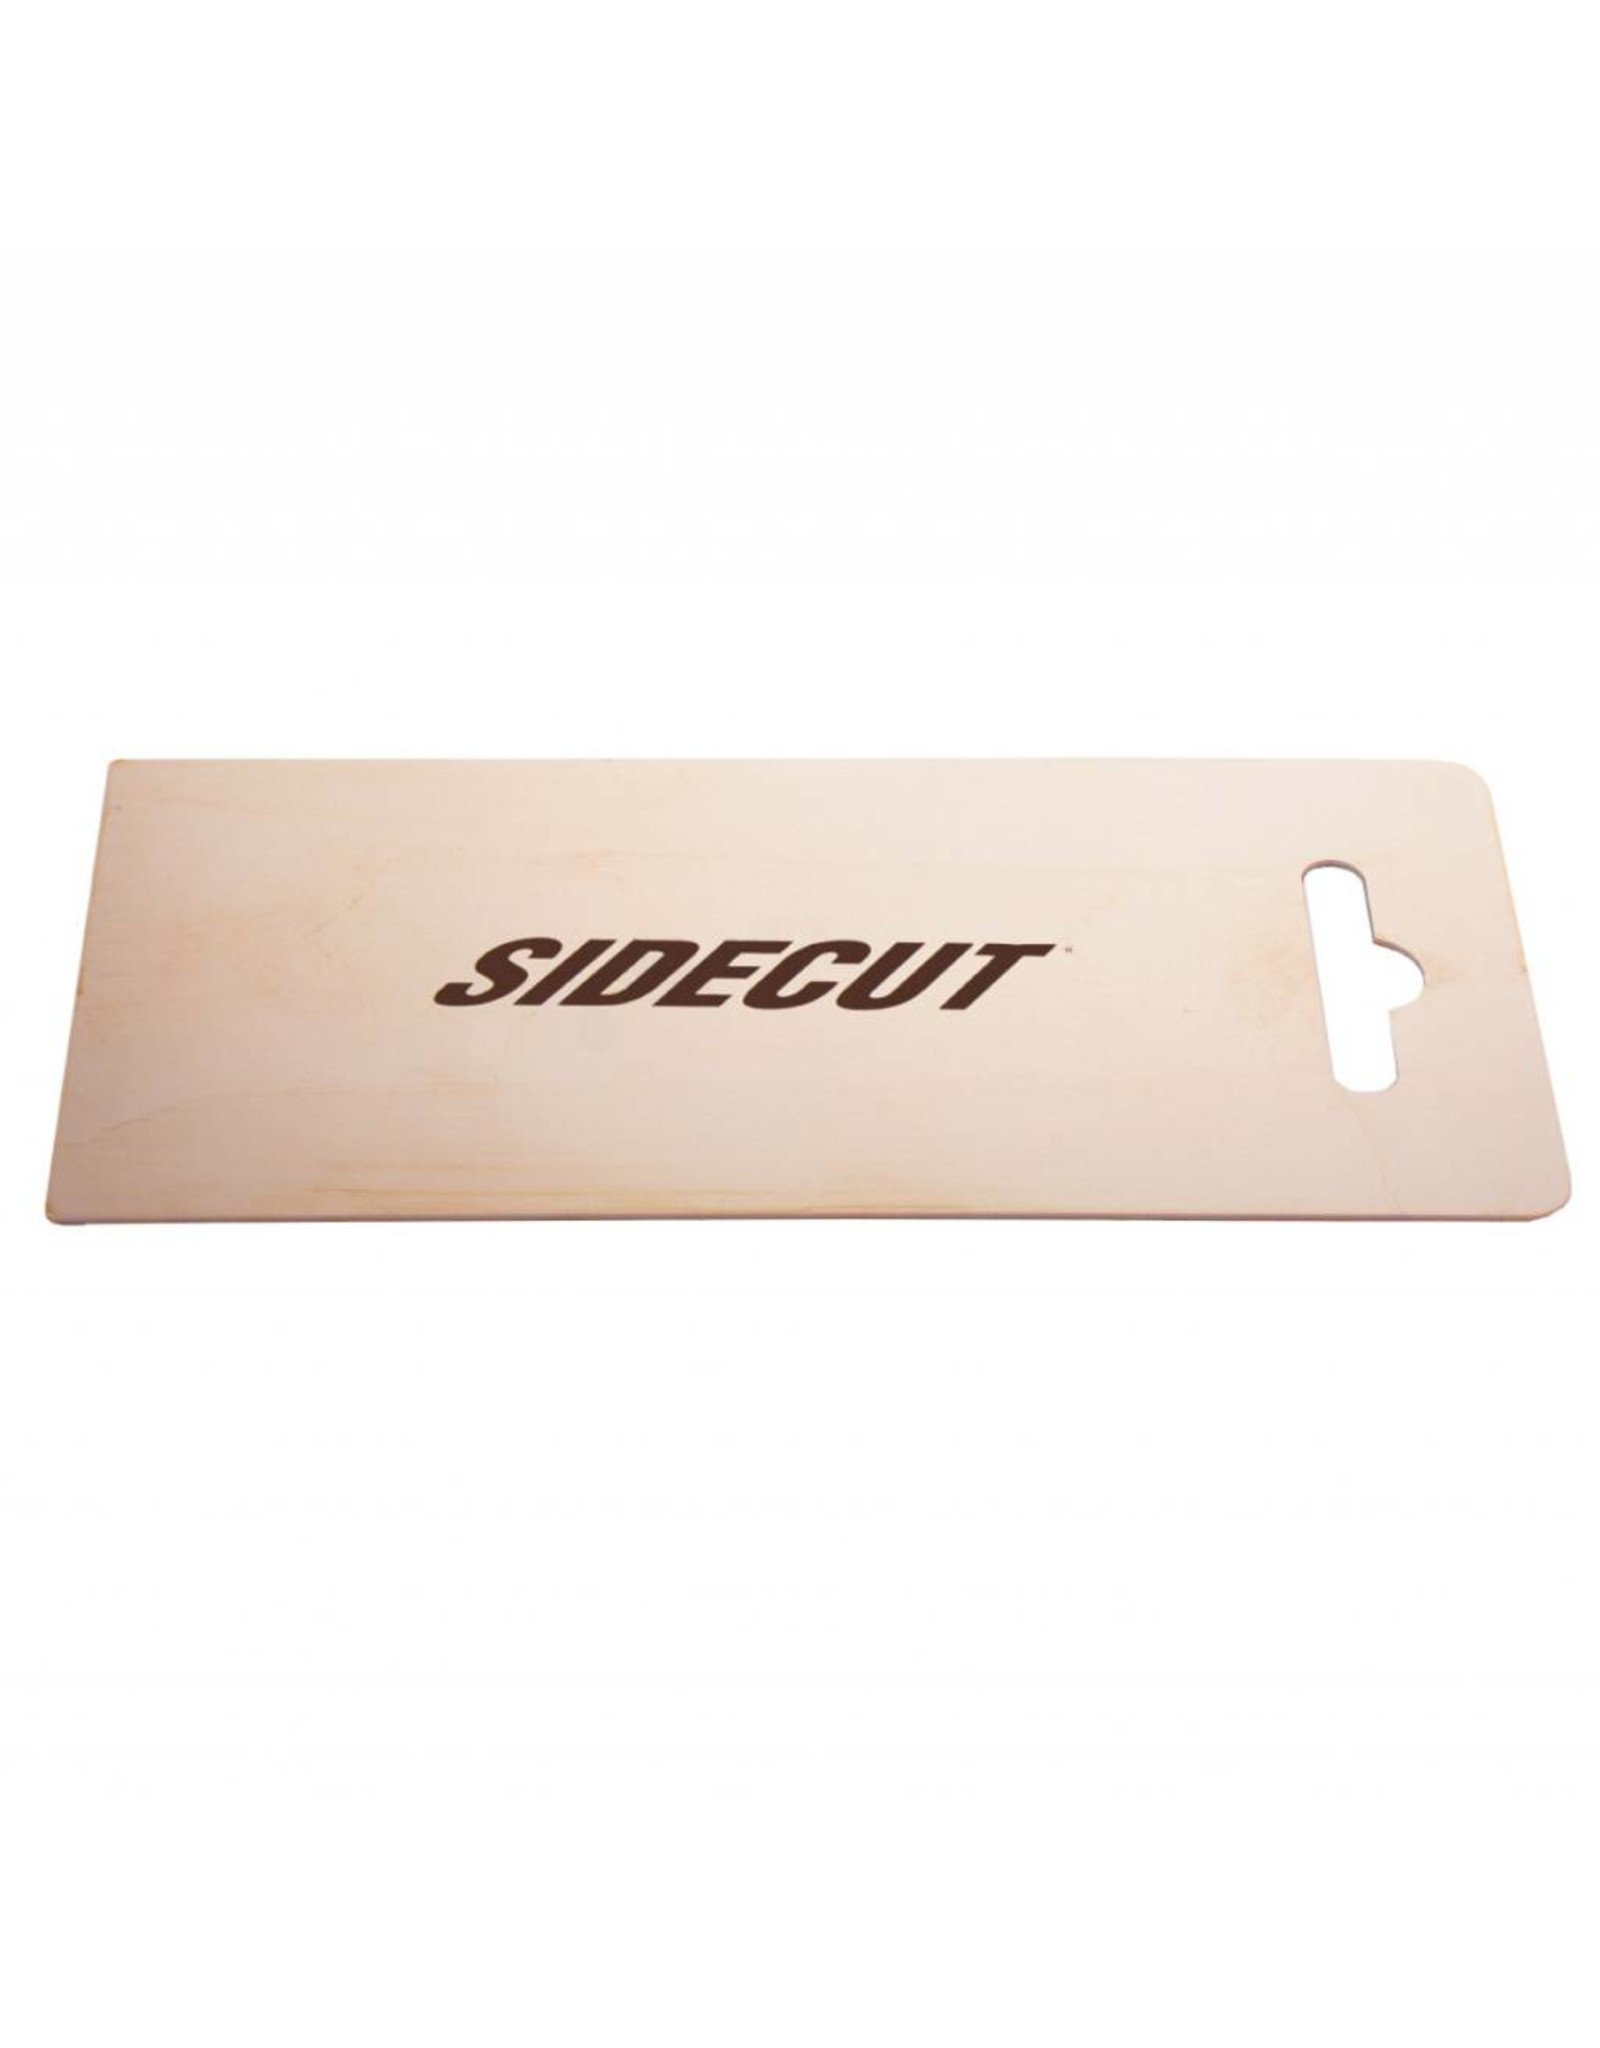 Sidecut Sidecut Steel Ski Scraper